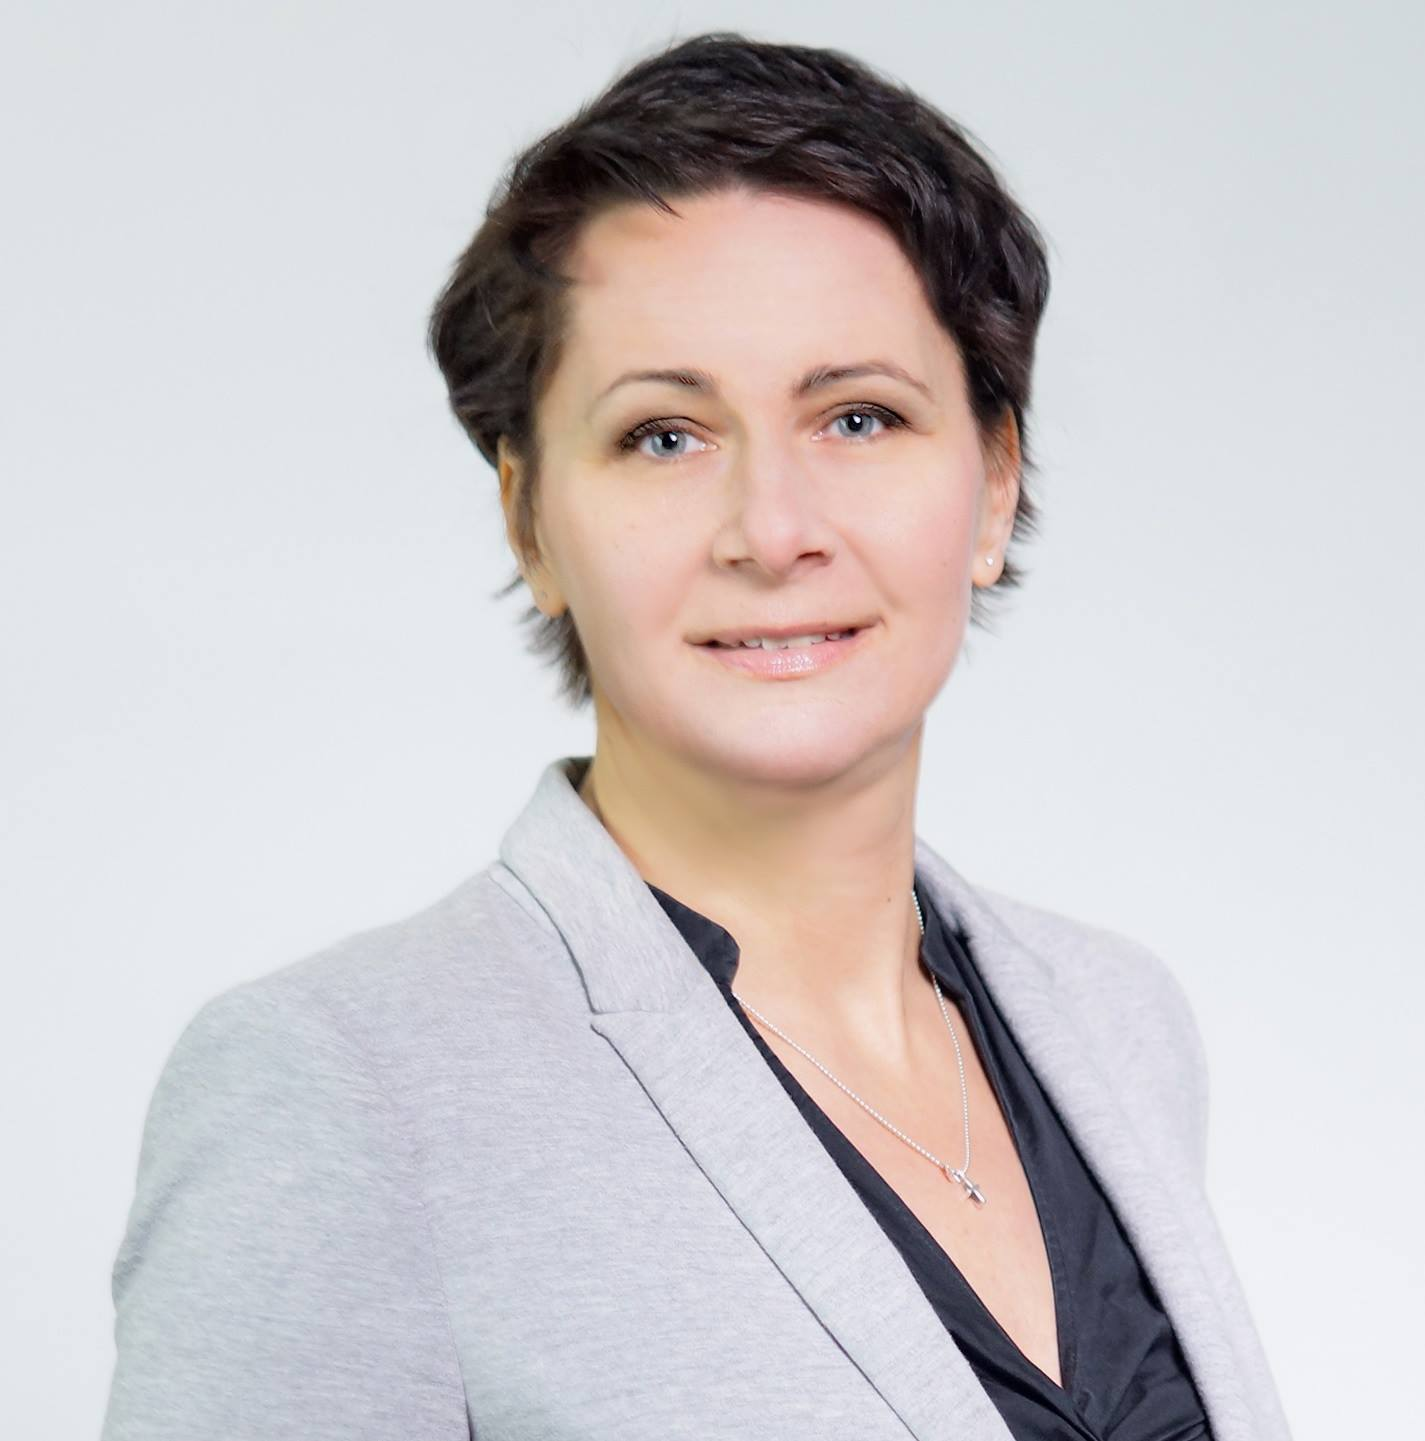 Hanna Wójcicka-Grudowska